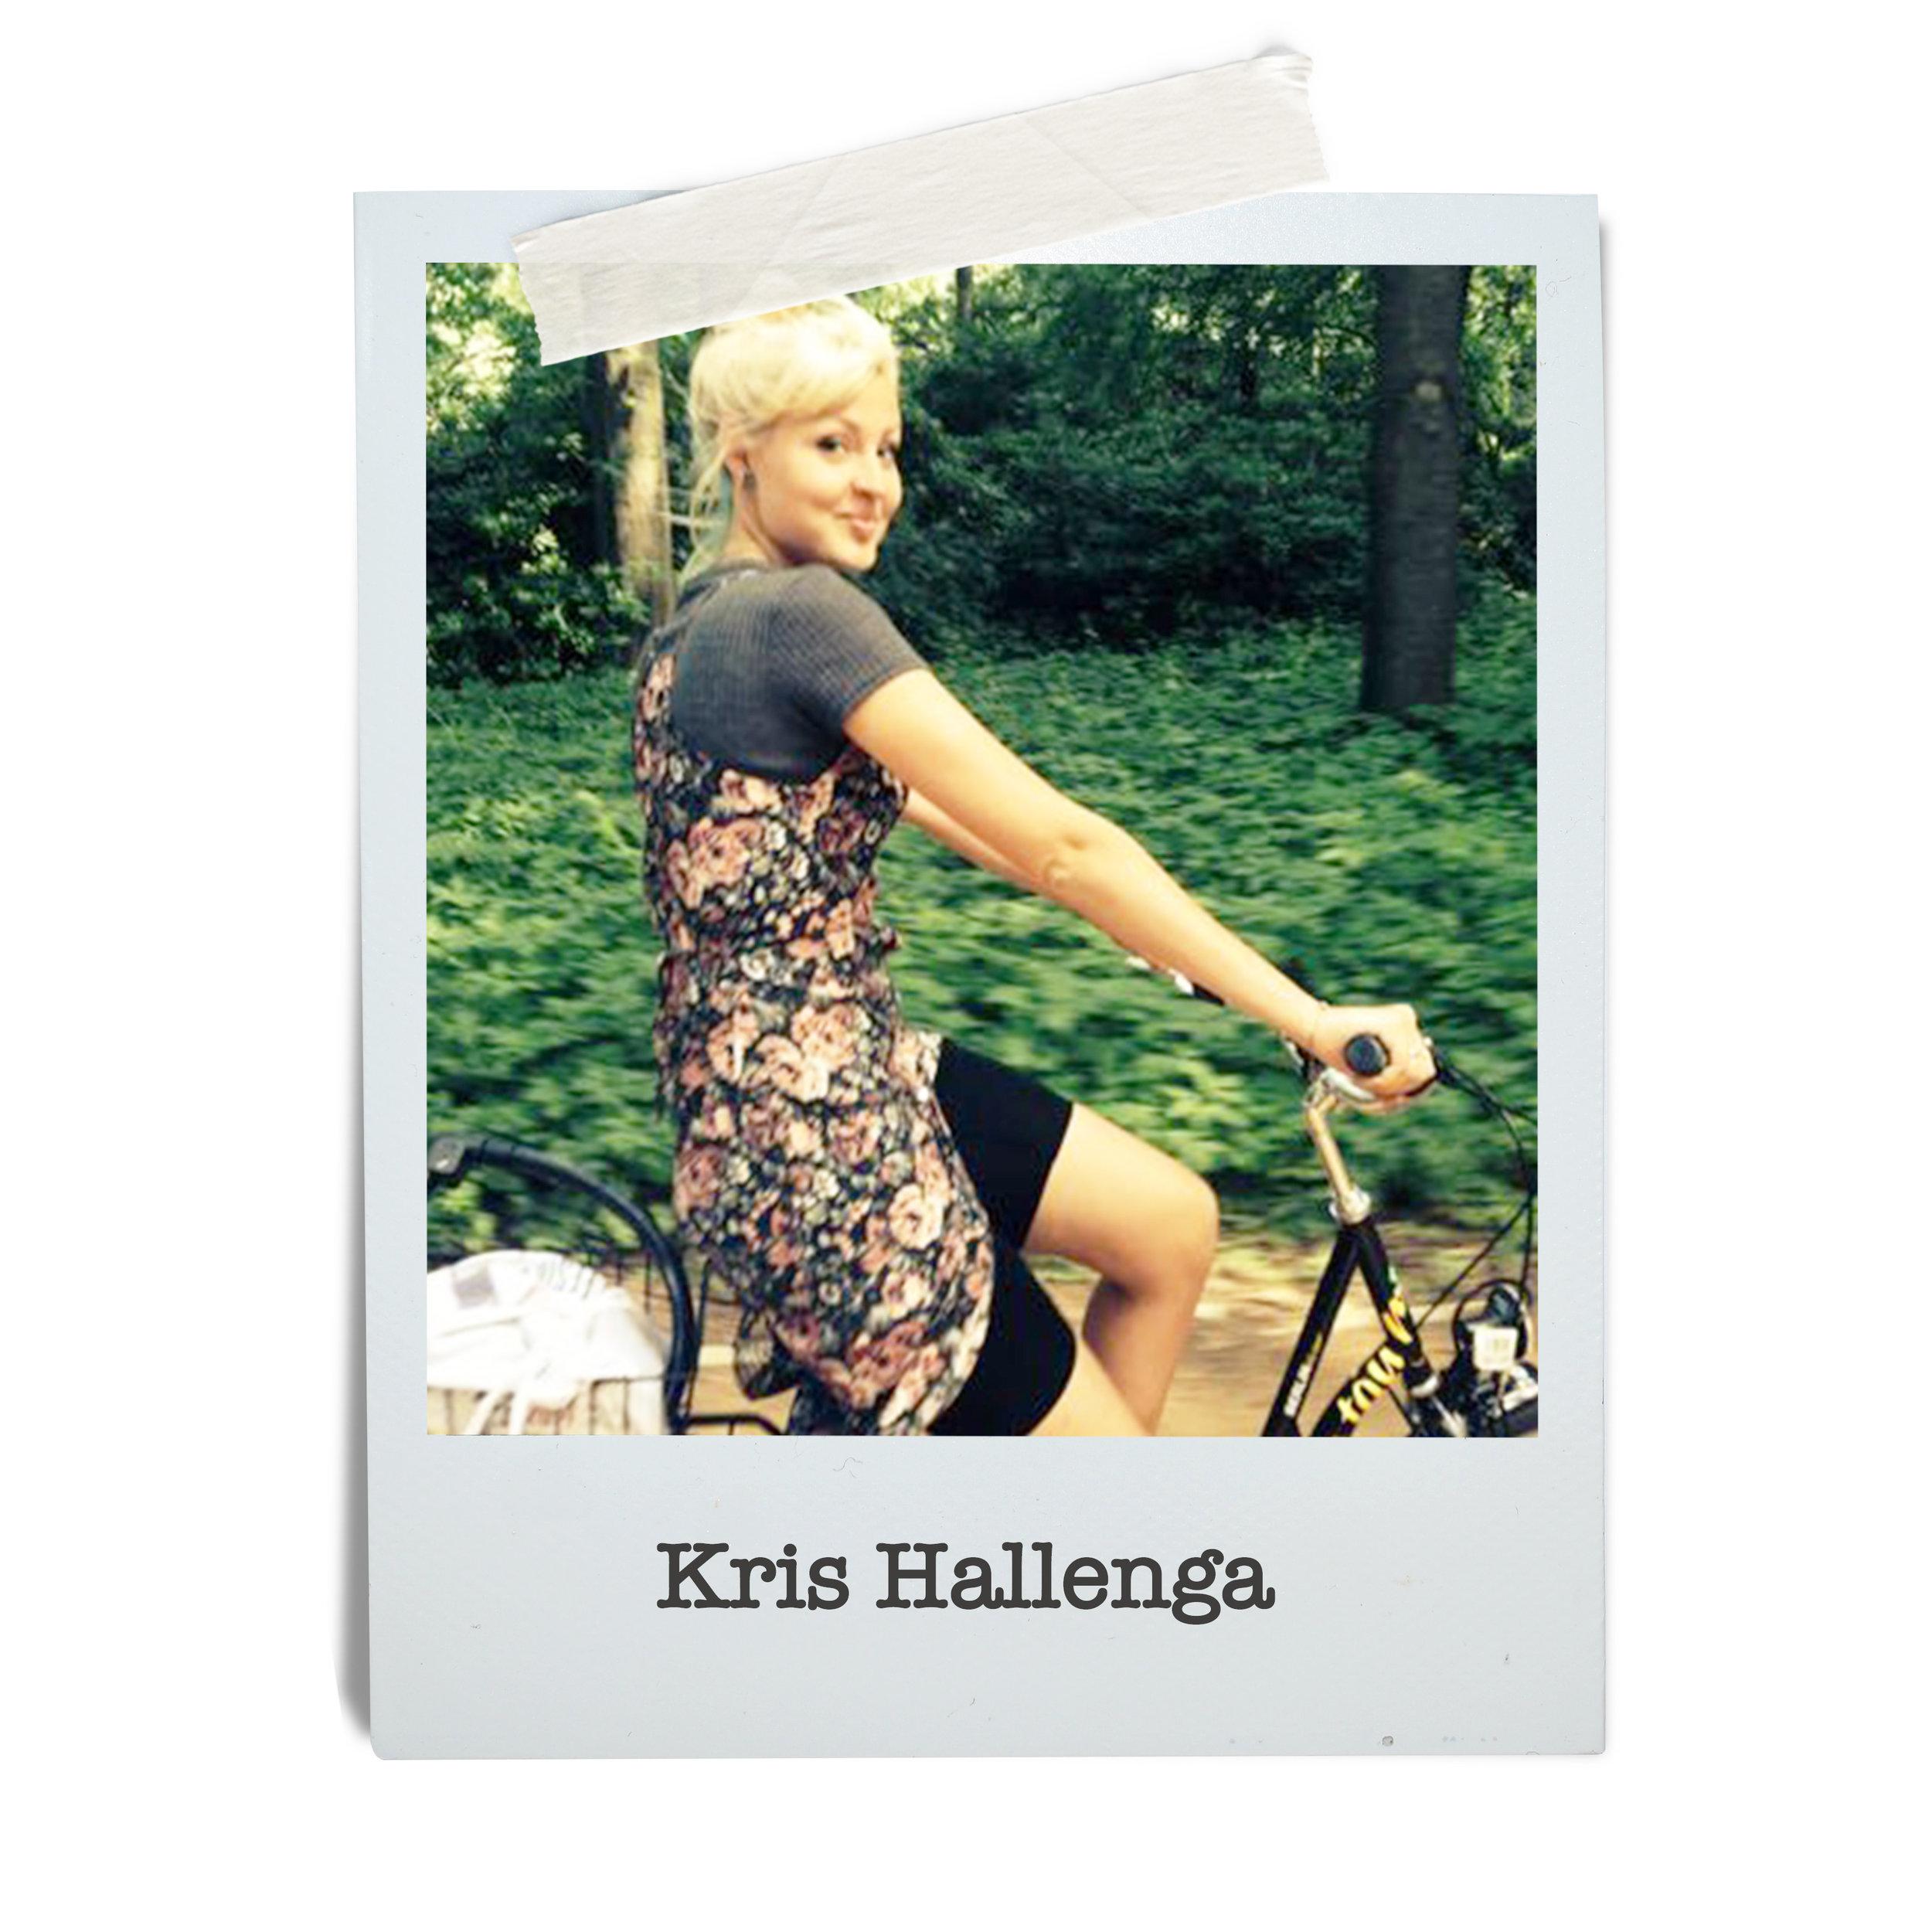 Kris Hallenga